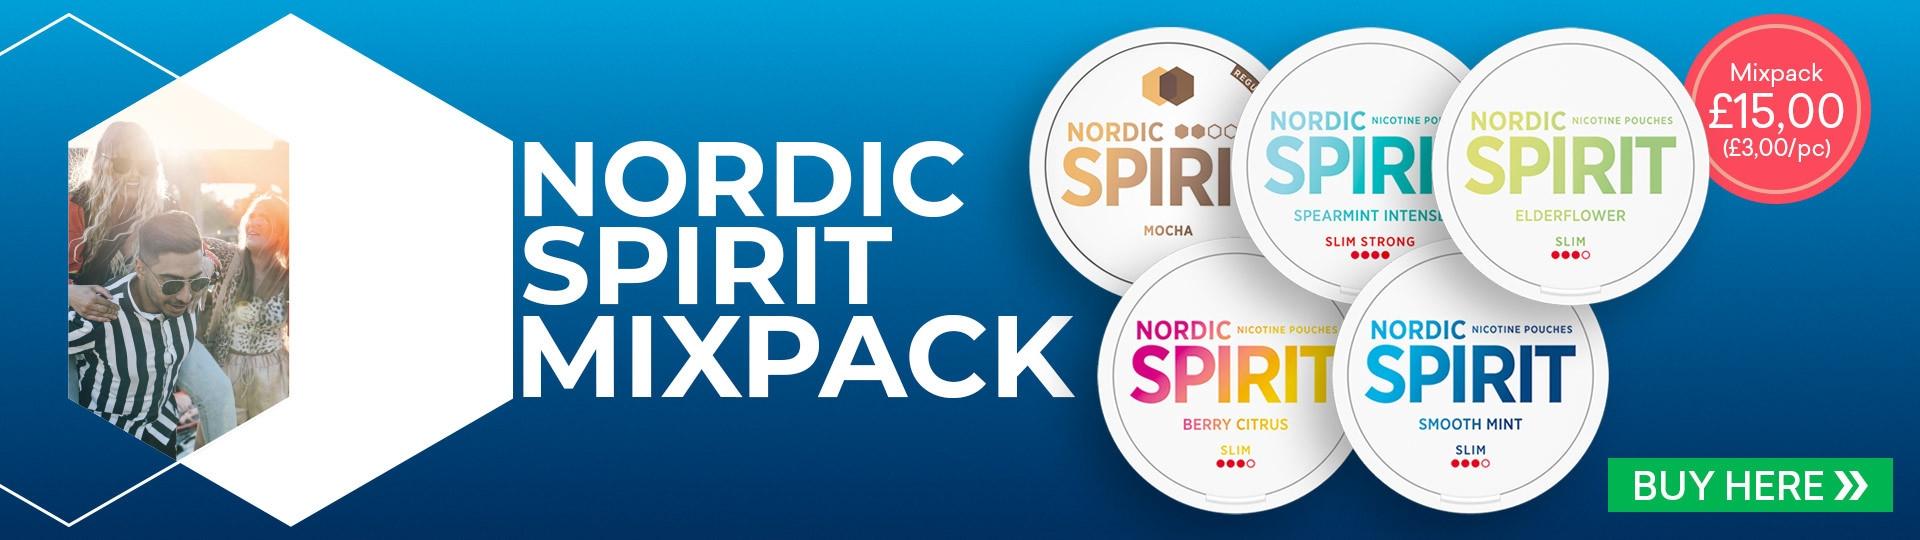 Nordic Spirit Mixpack